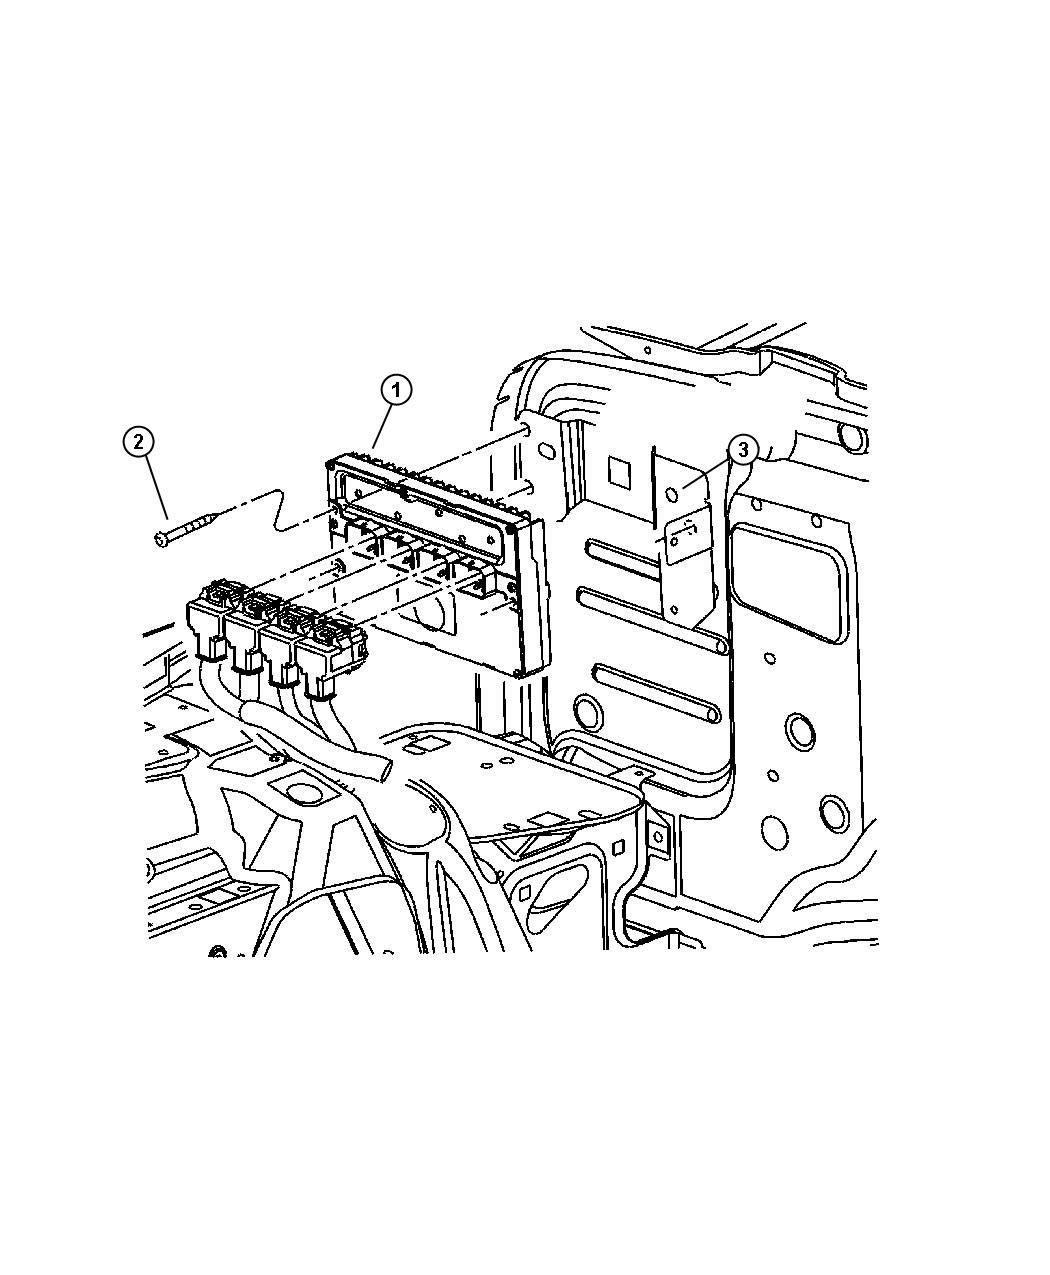 jeep wrangler module powertrain control emissions. Black Bedroom Furniture Sets. Home Design Ideas